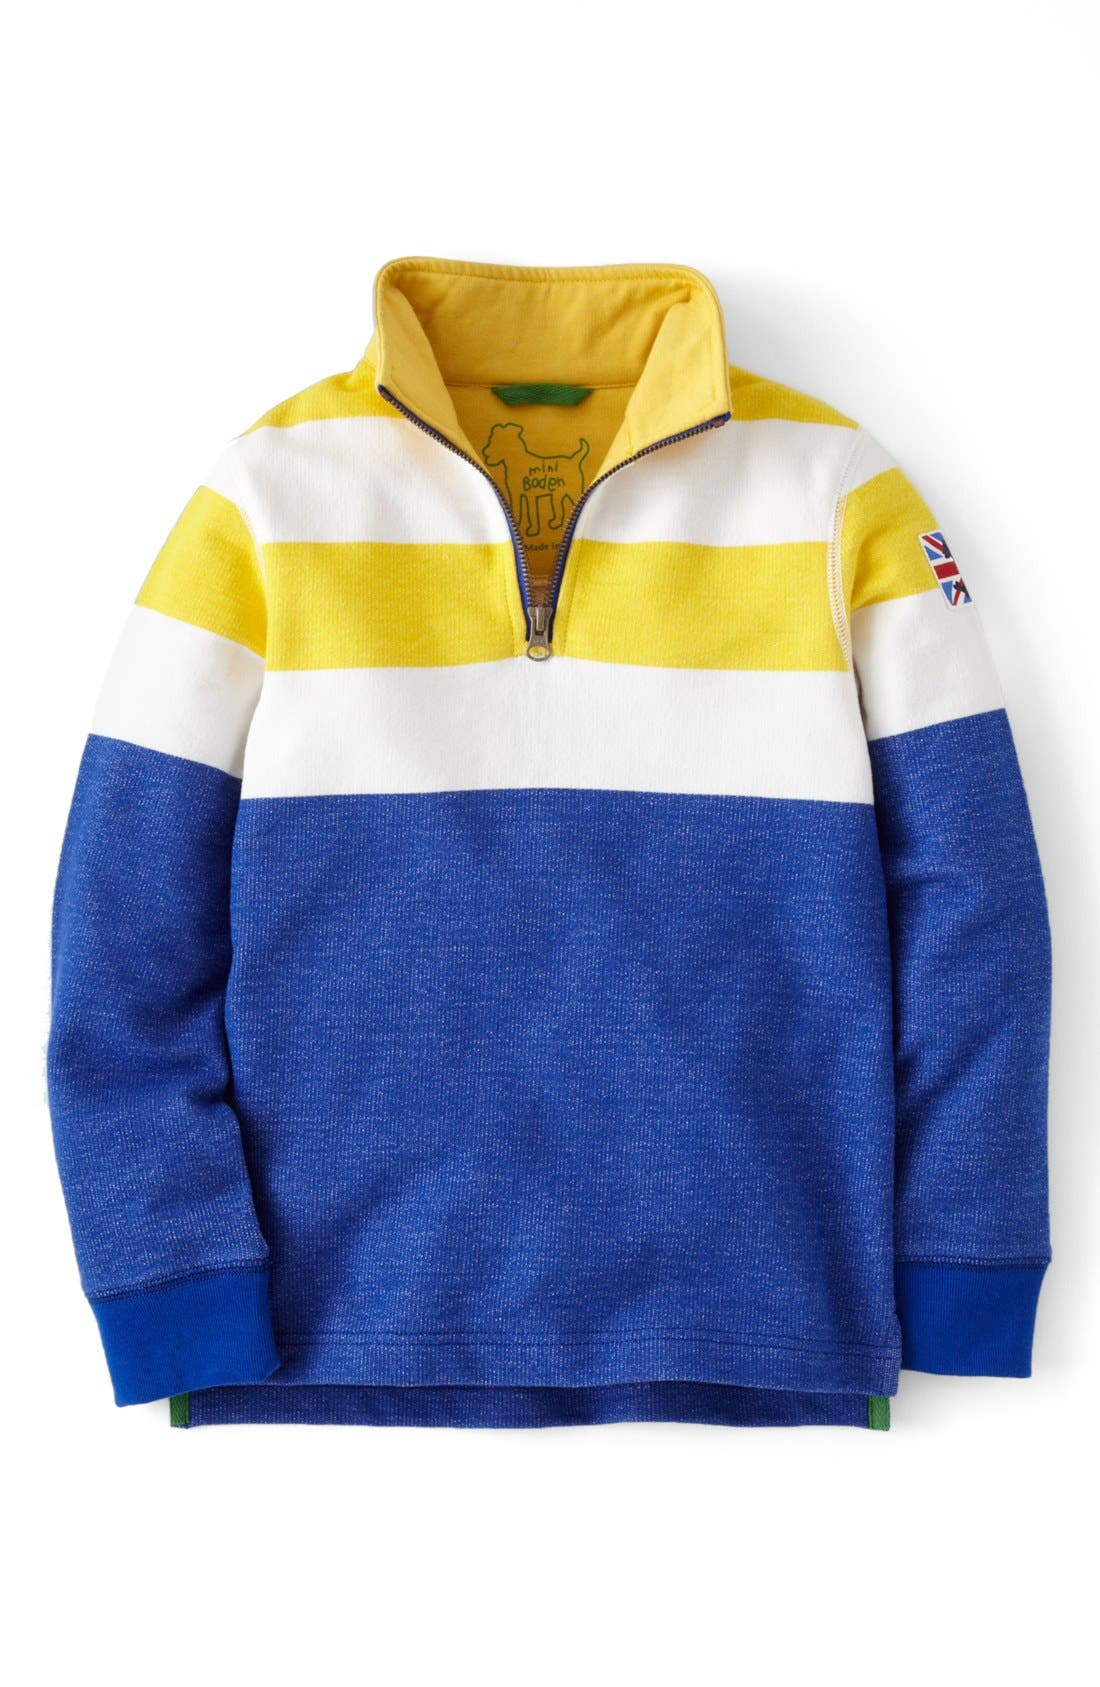 Main Image - Mini Boden Half Zip Sweater (Toddler Boys, Little Boys & Big Boys)